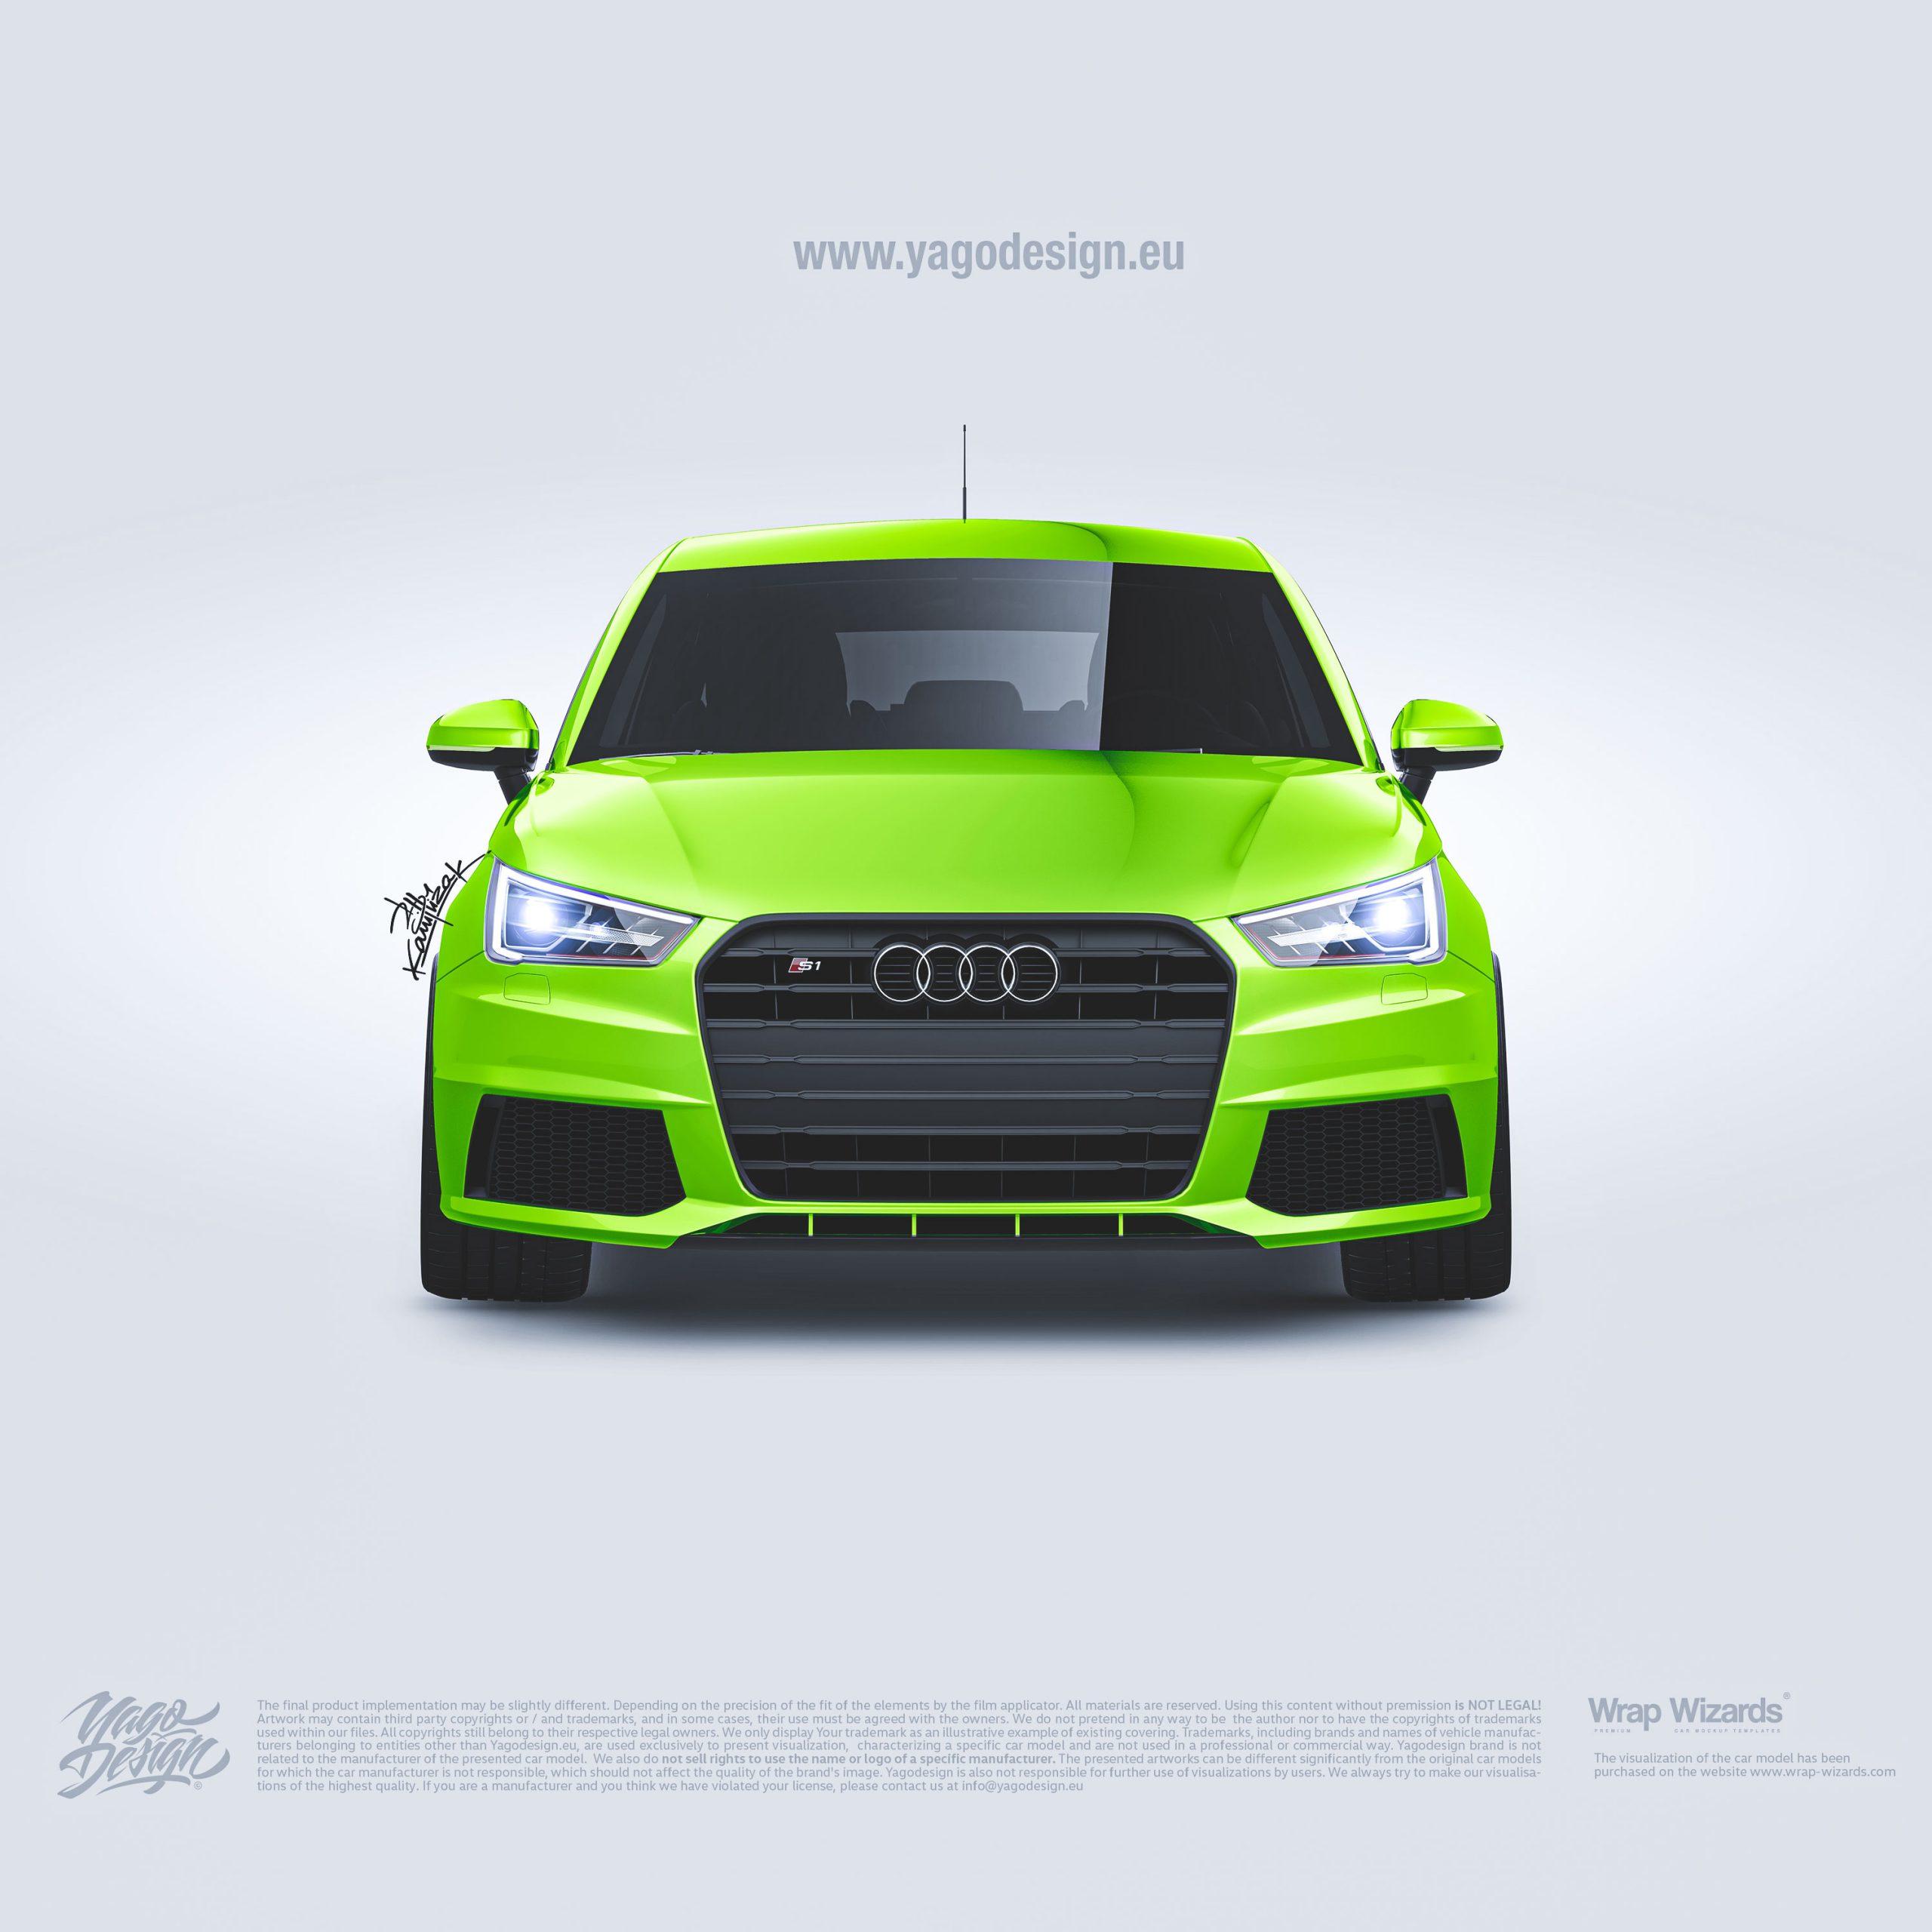 Audi-A1-Sportback-by-Yagodesign-Automotive-Design-Studio3-scaled